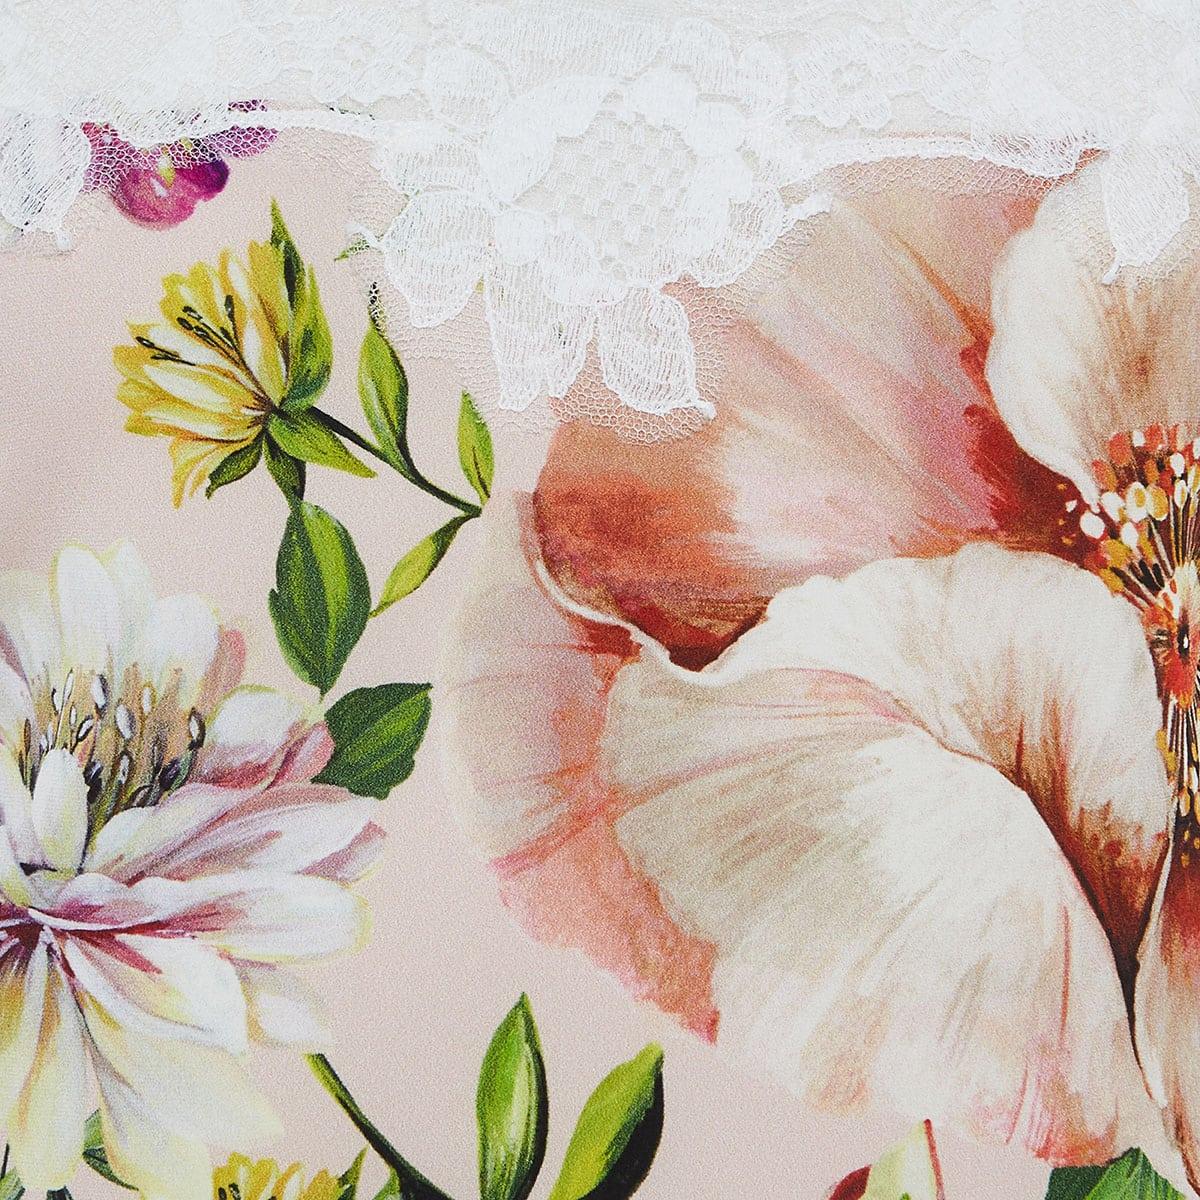 Lace-trimmed floral slip top